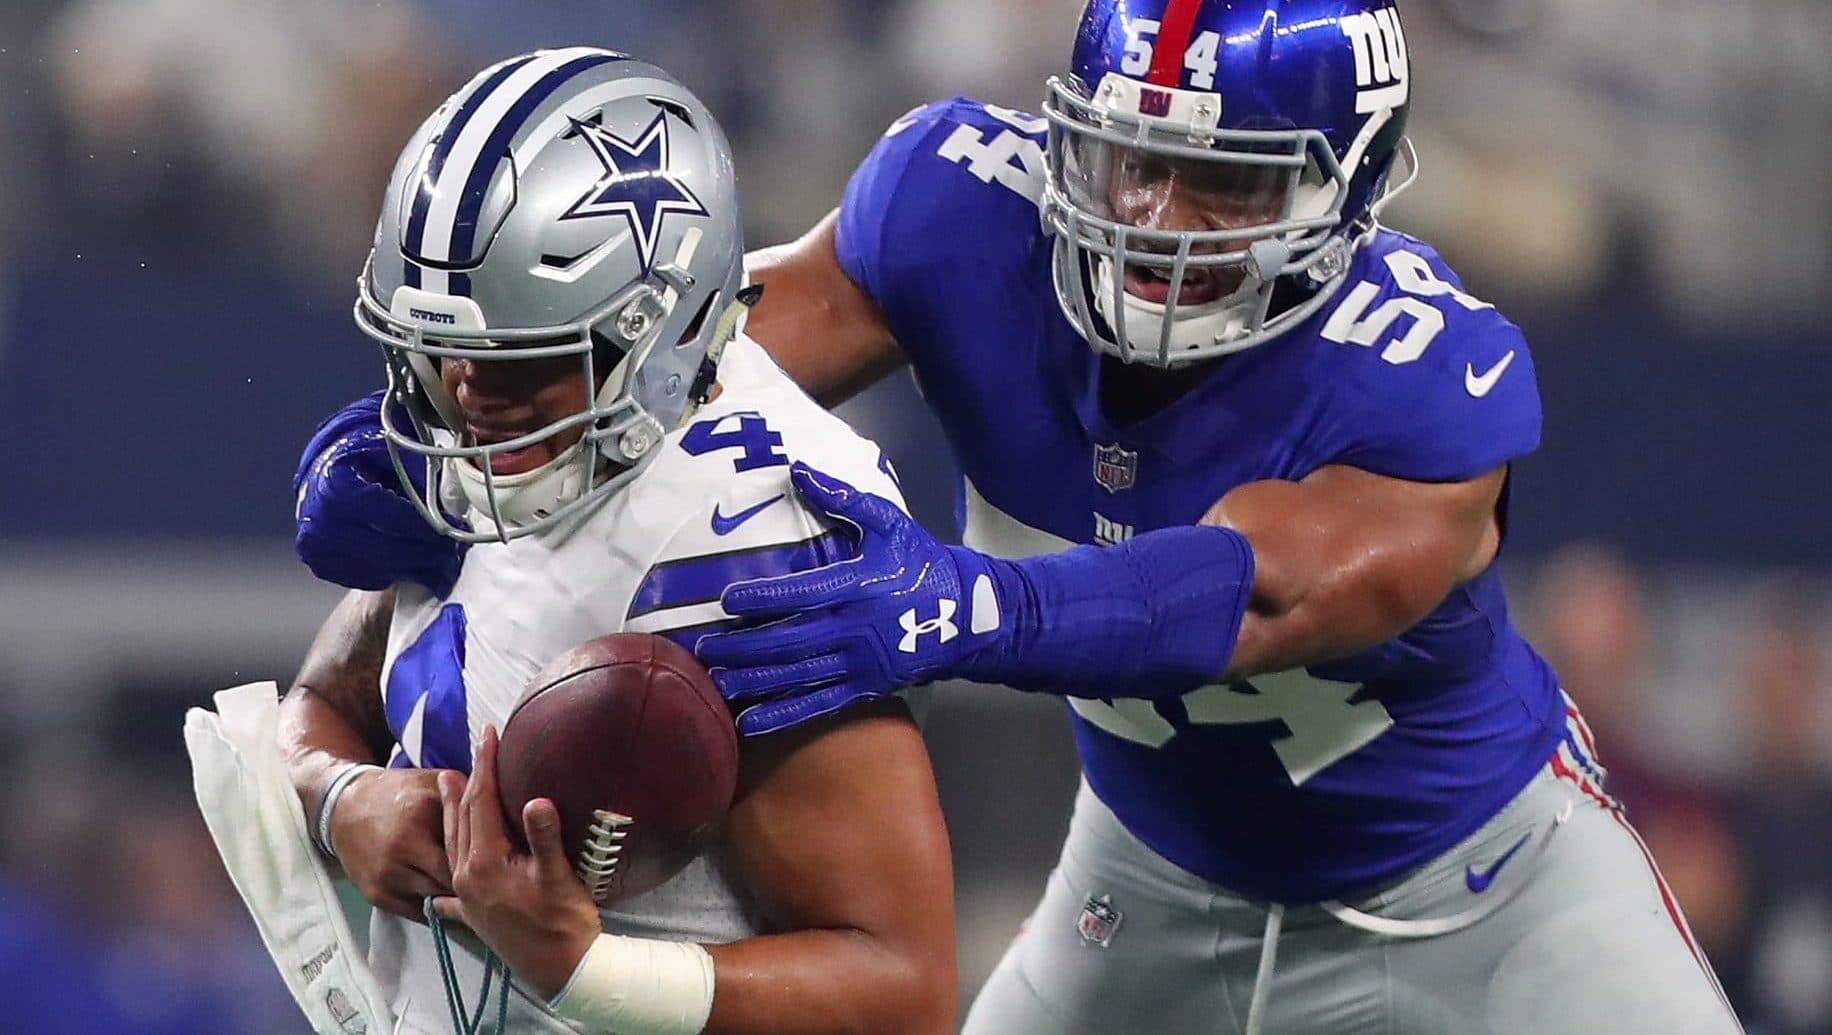 New-york-giants-vs-dallas-cowboys-e1519102378740